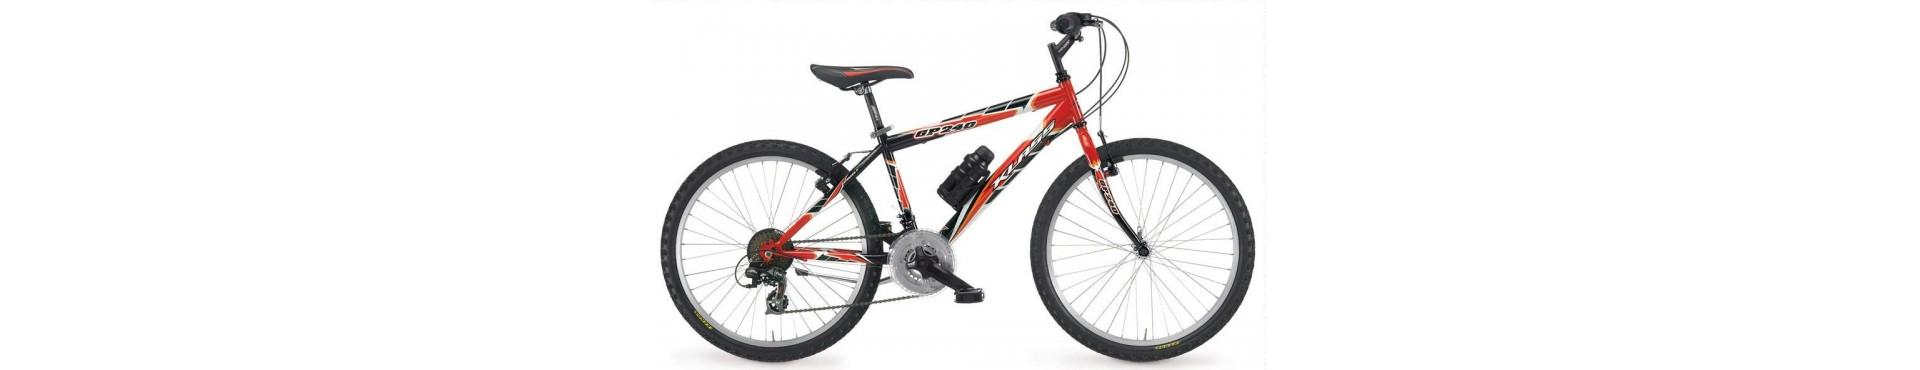 Mountain bike classica